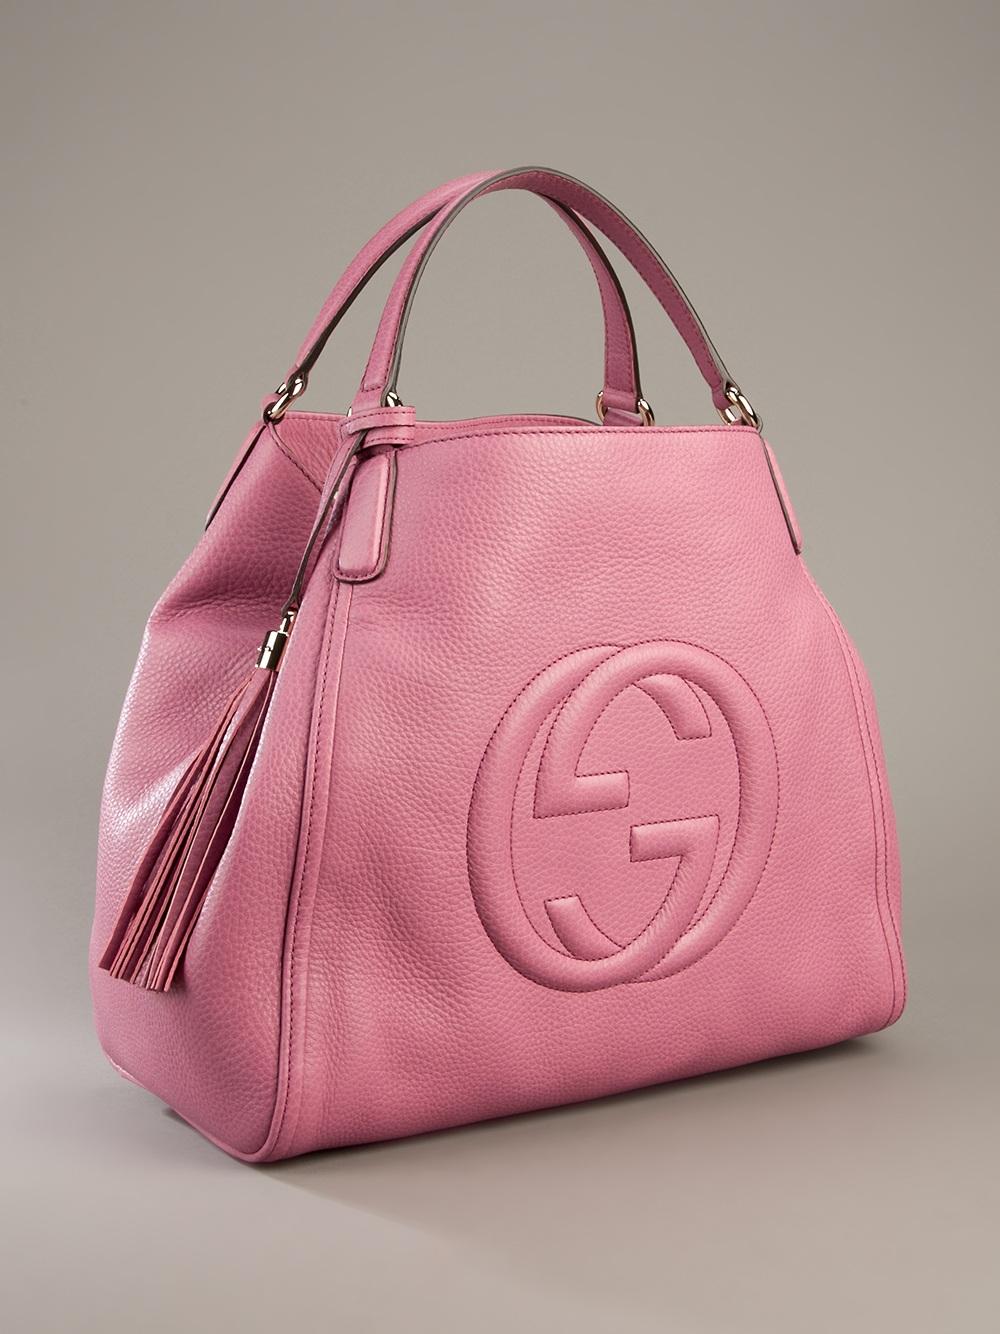 Gucci Handbags Pink - Handbag Photos Eleventyone.Org 20e66342c877d